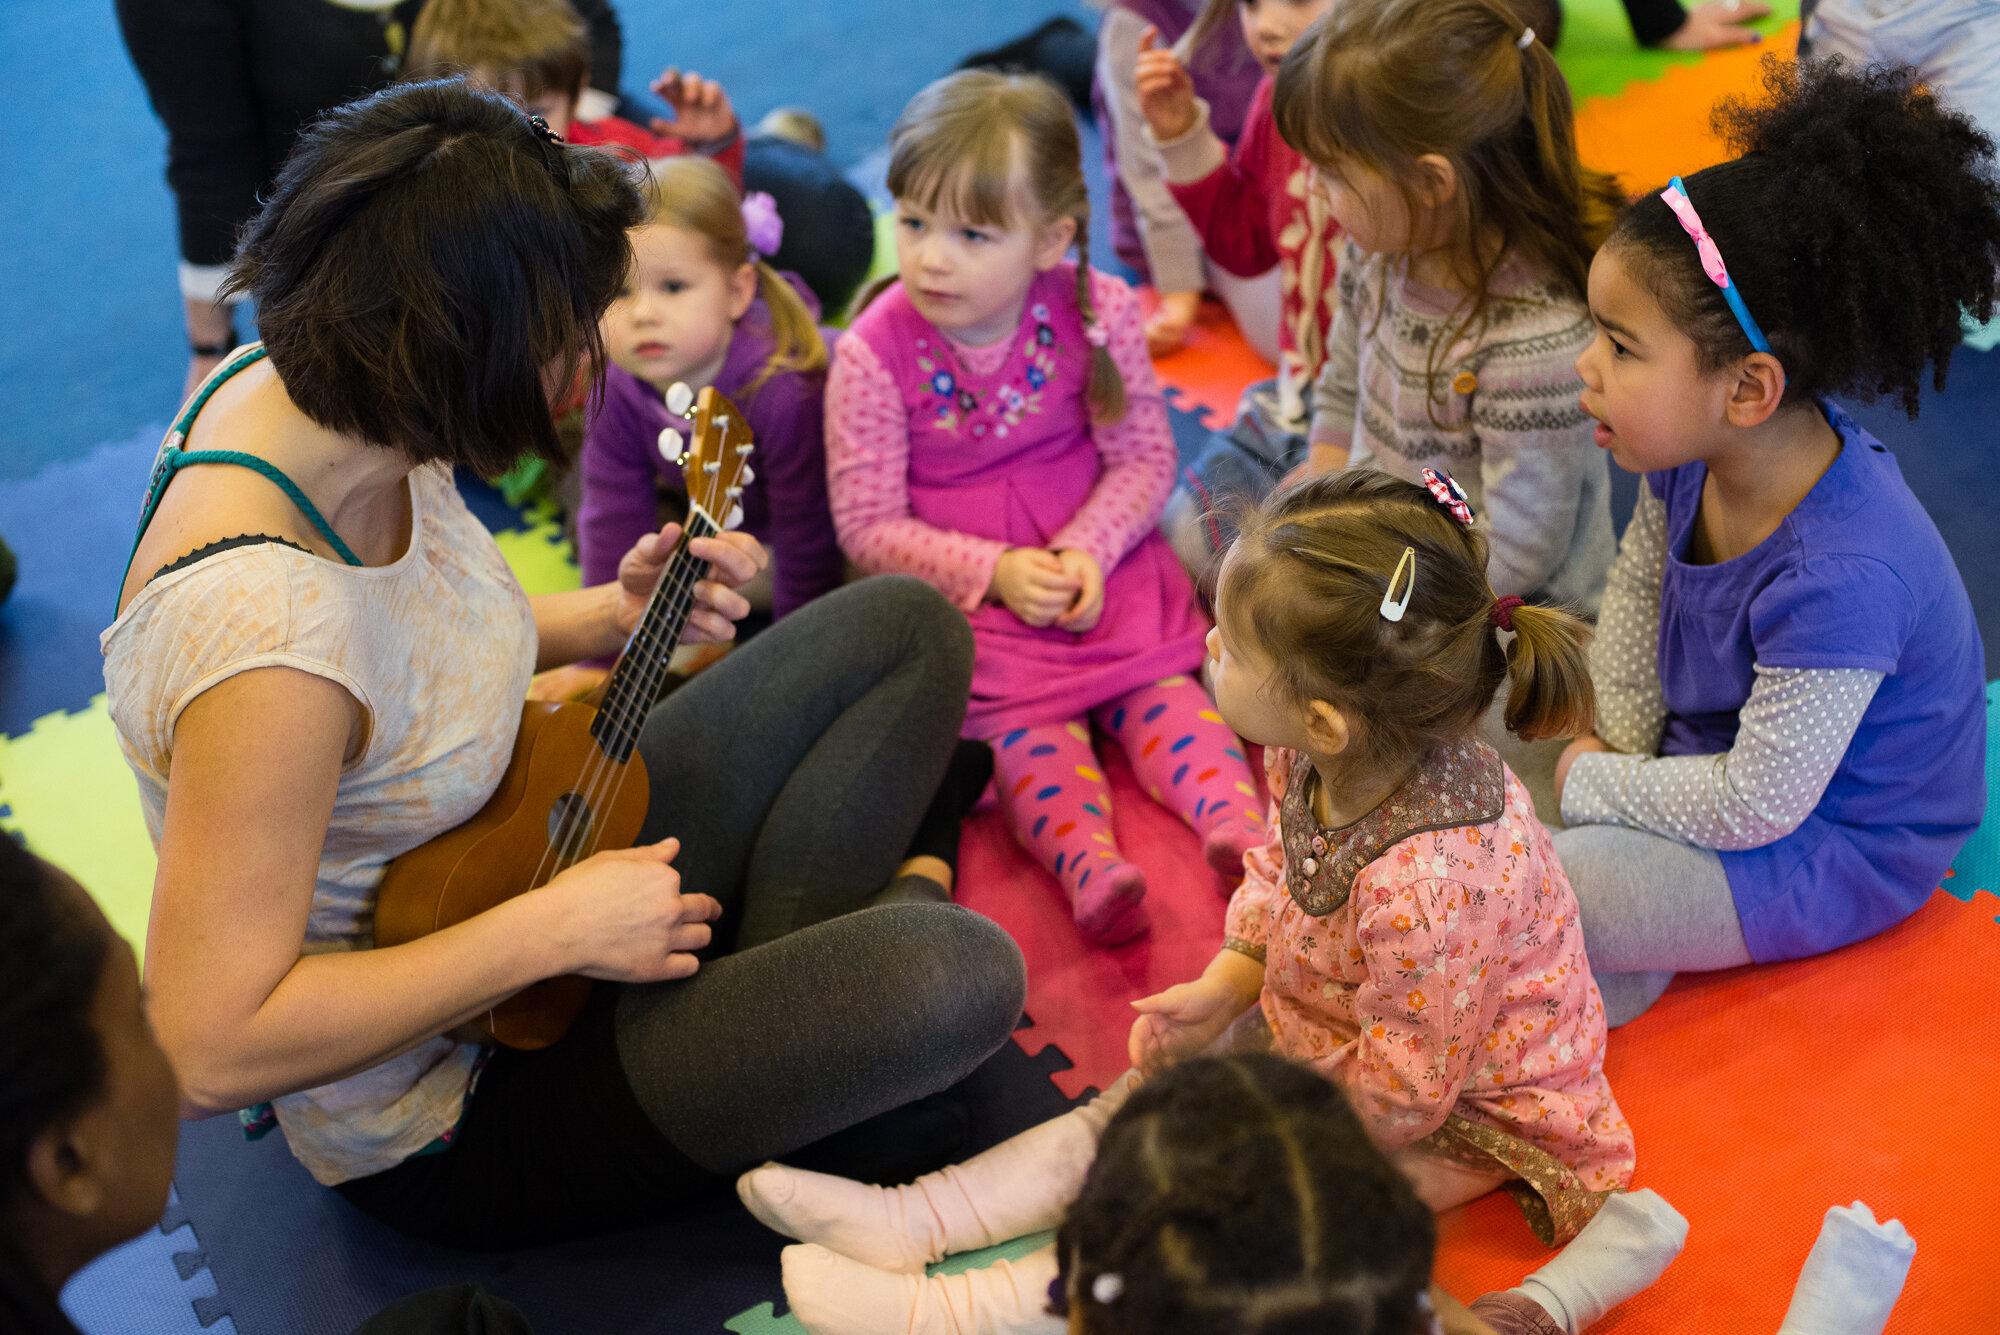 Ukulele & preschoolers2.jpg